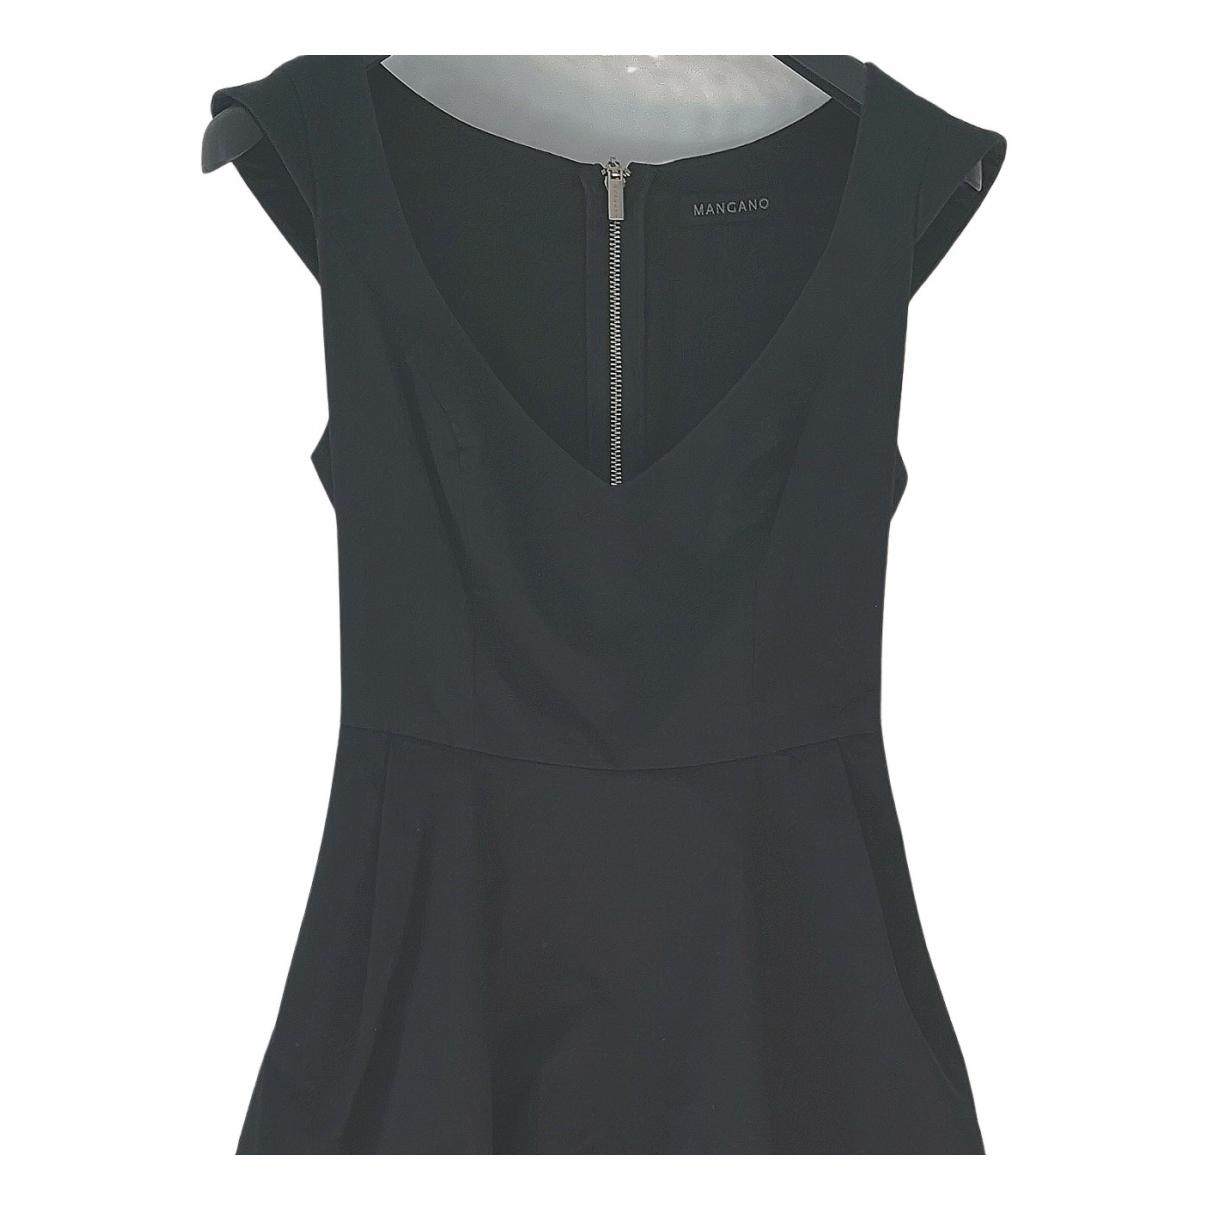 Mangano - Robe   pour femme en coton - elasthane - noir